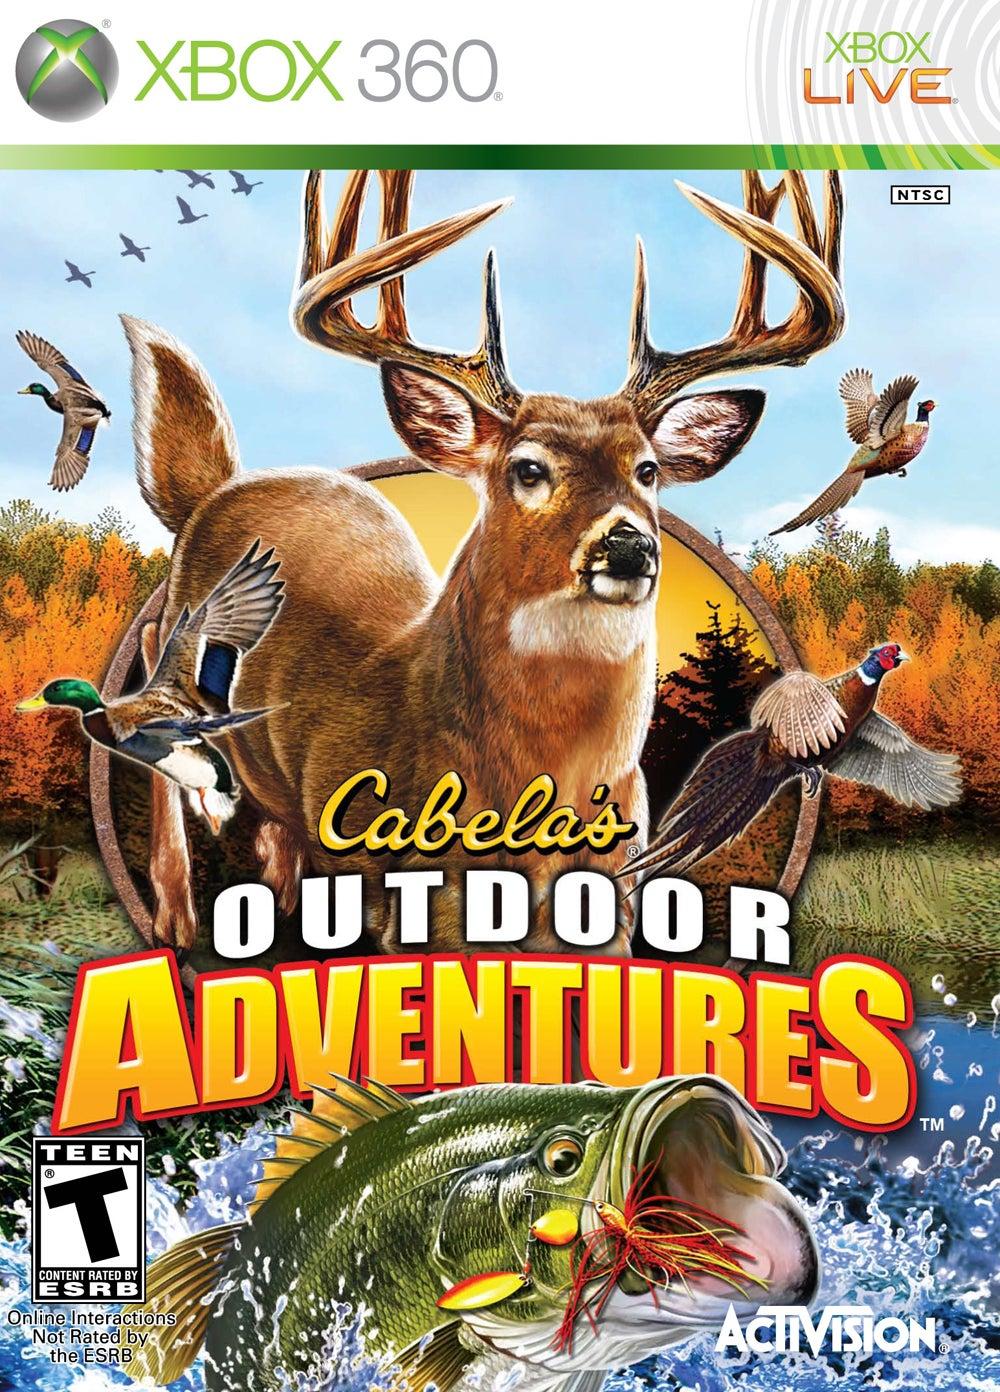 Cabela's Outdoor Adventures - Xbox 360 - IGN